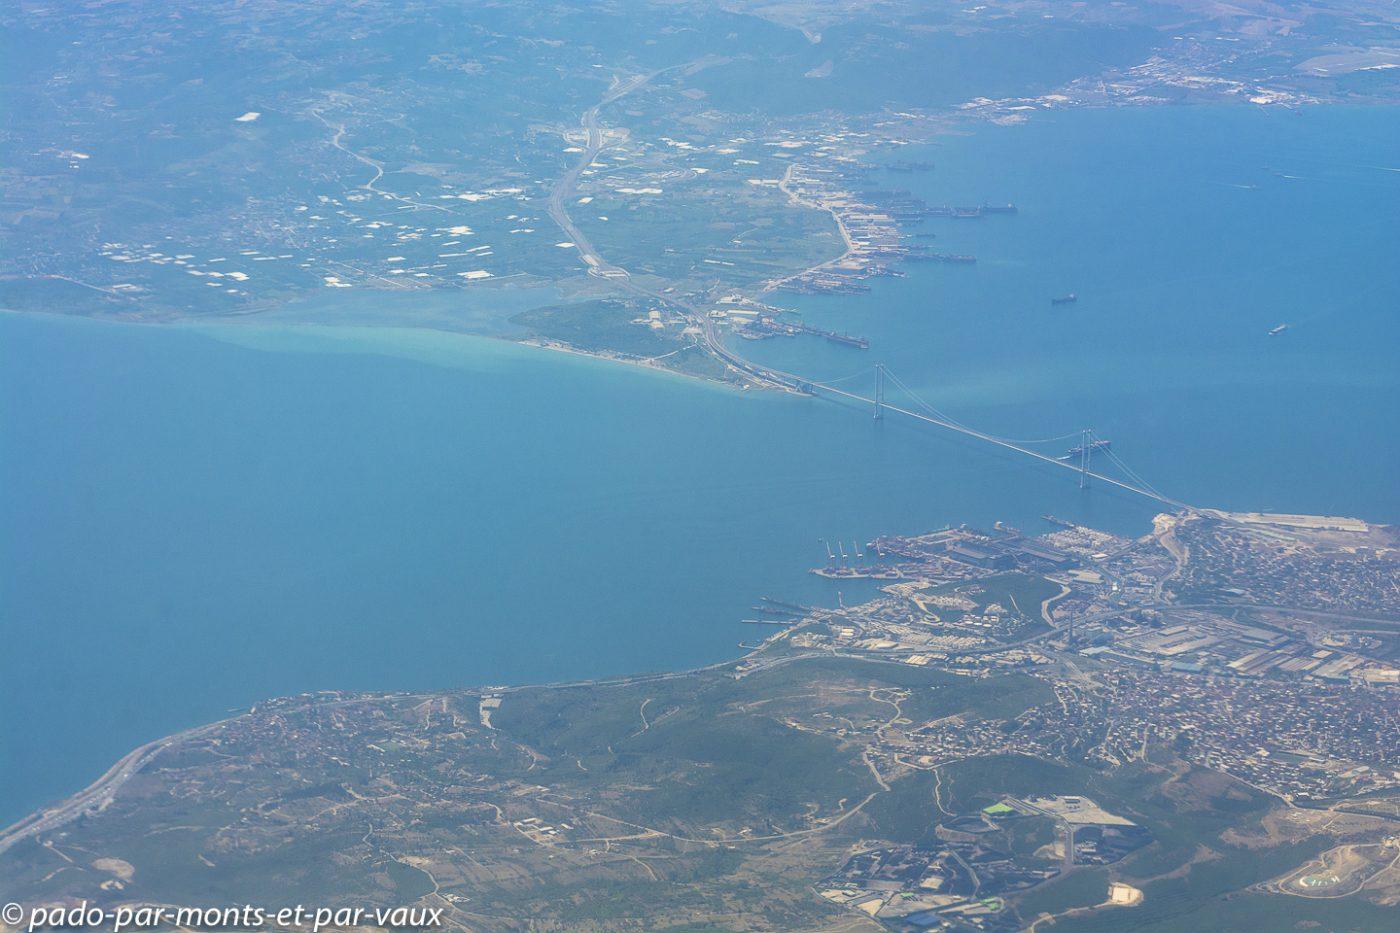 Vol Bichkek - Istanbul - Turquie - arrivée sur Istanbul